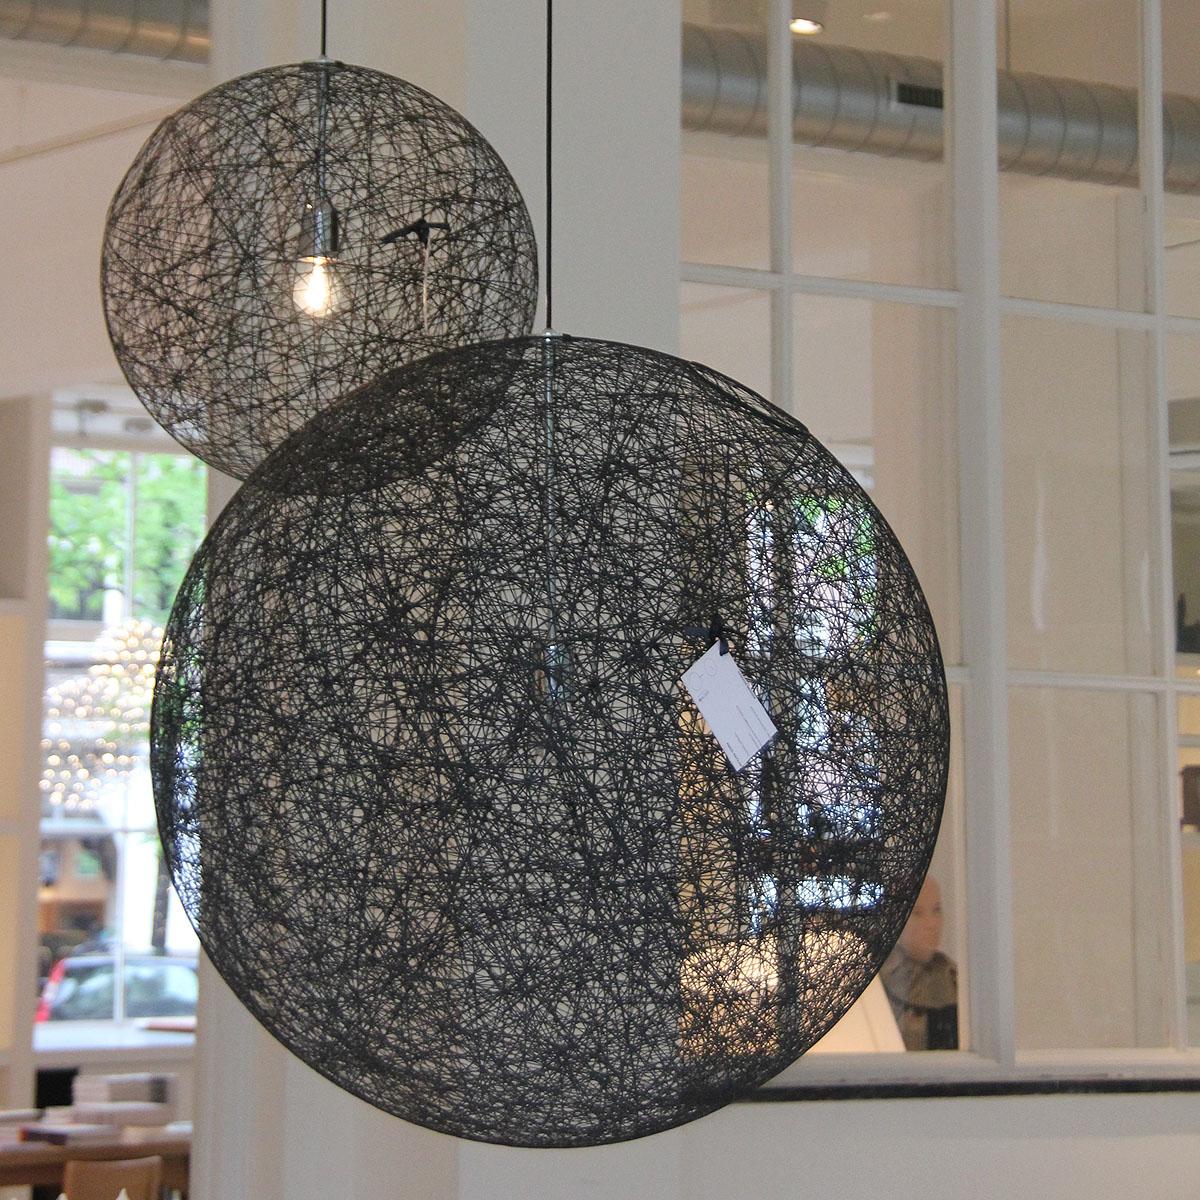 Moooi Design in Amsterdam  modern design by moderndesignorg